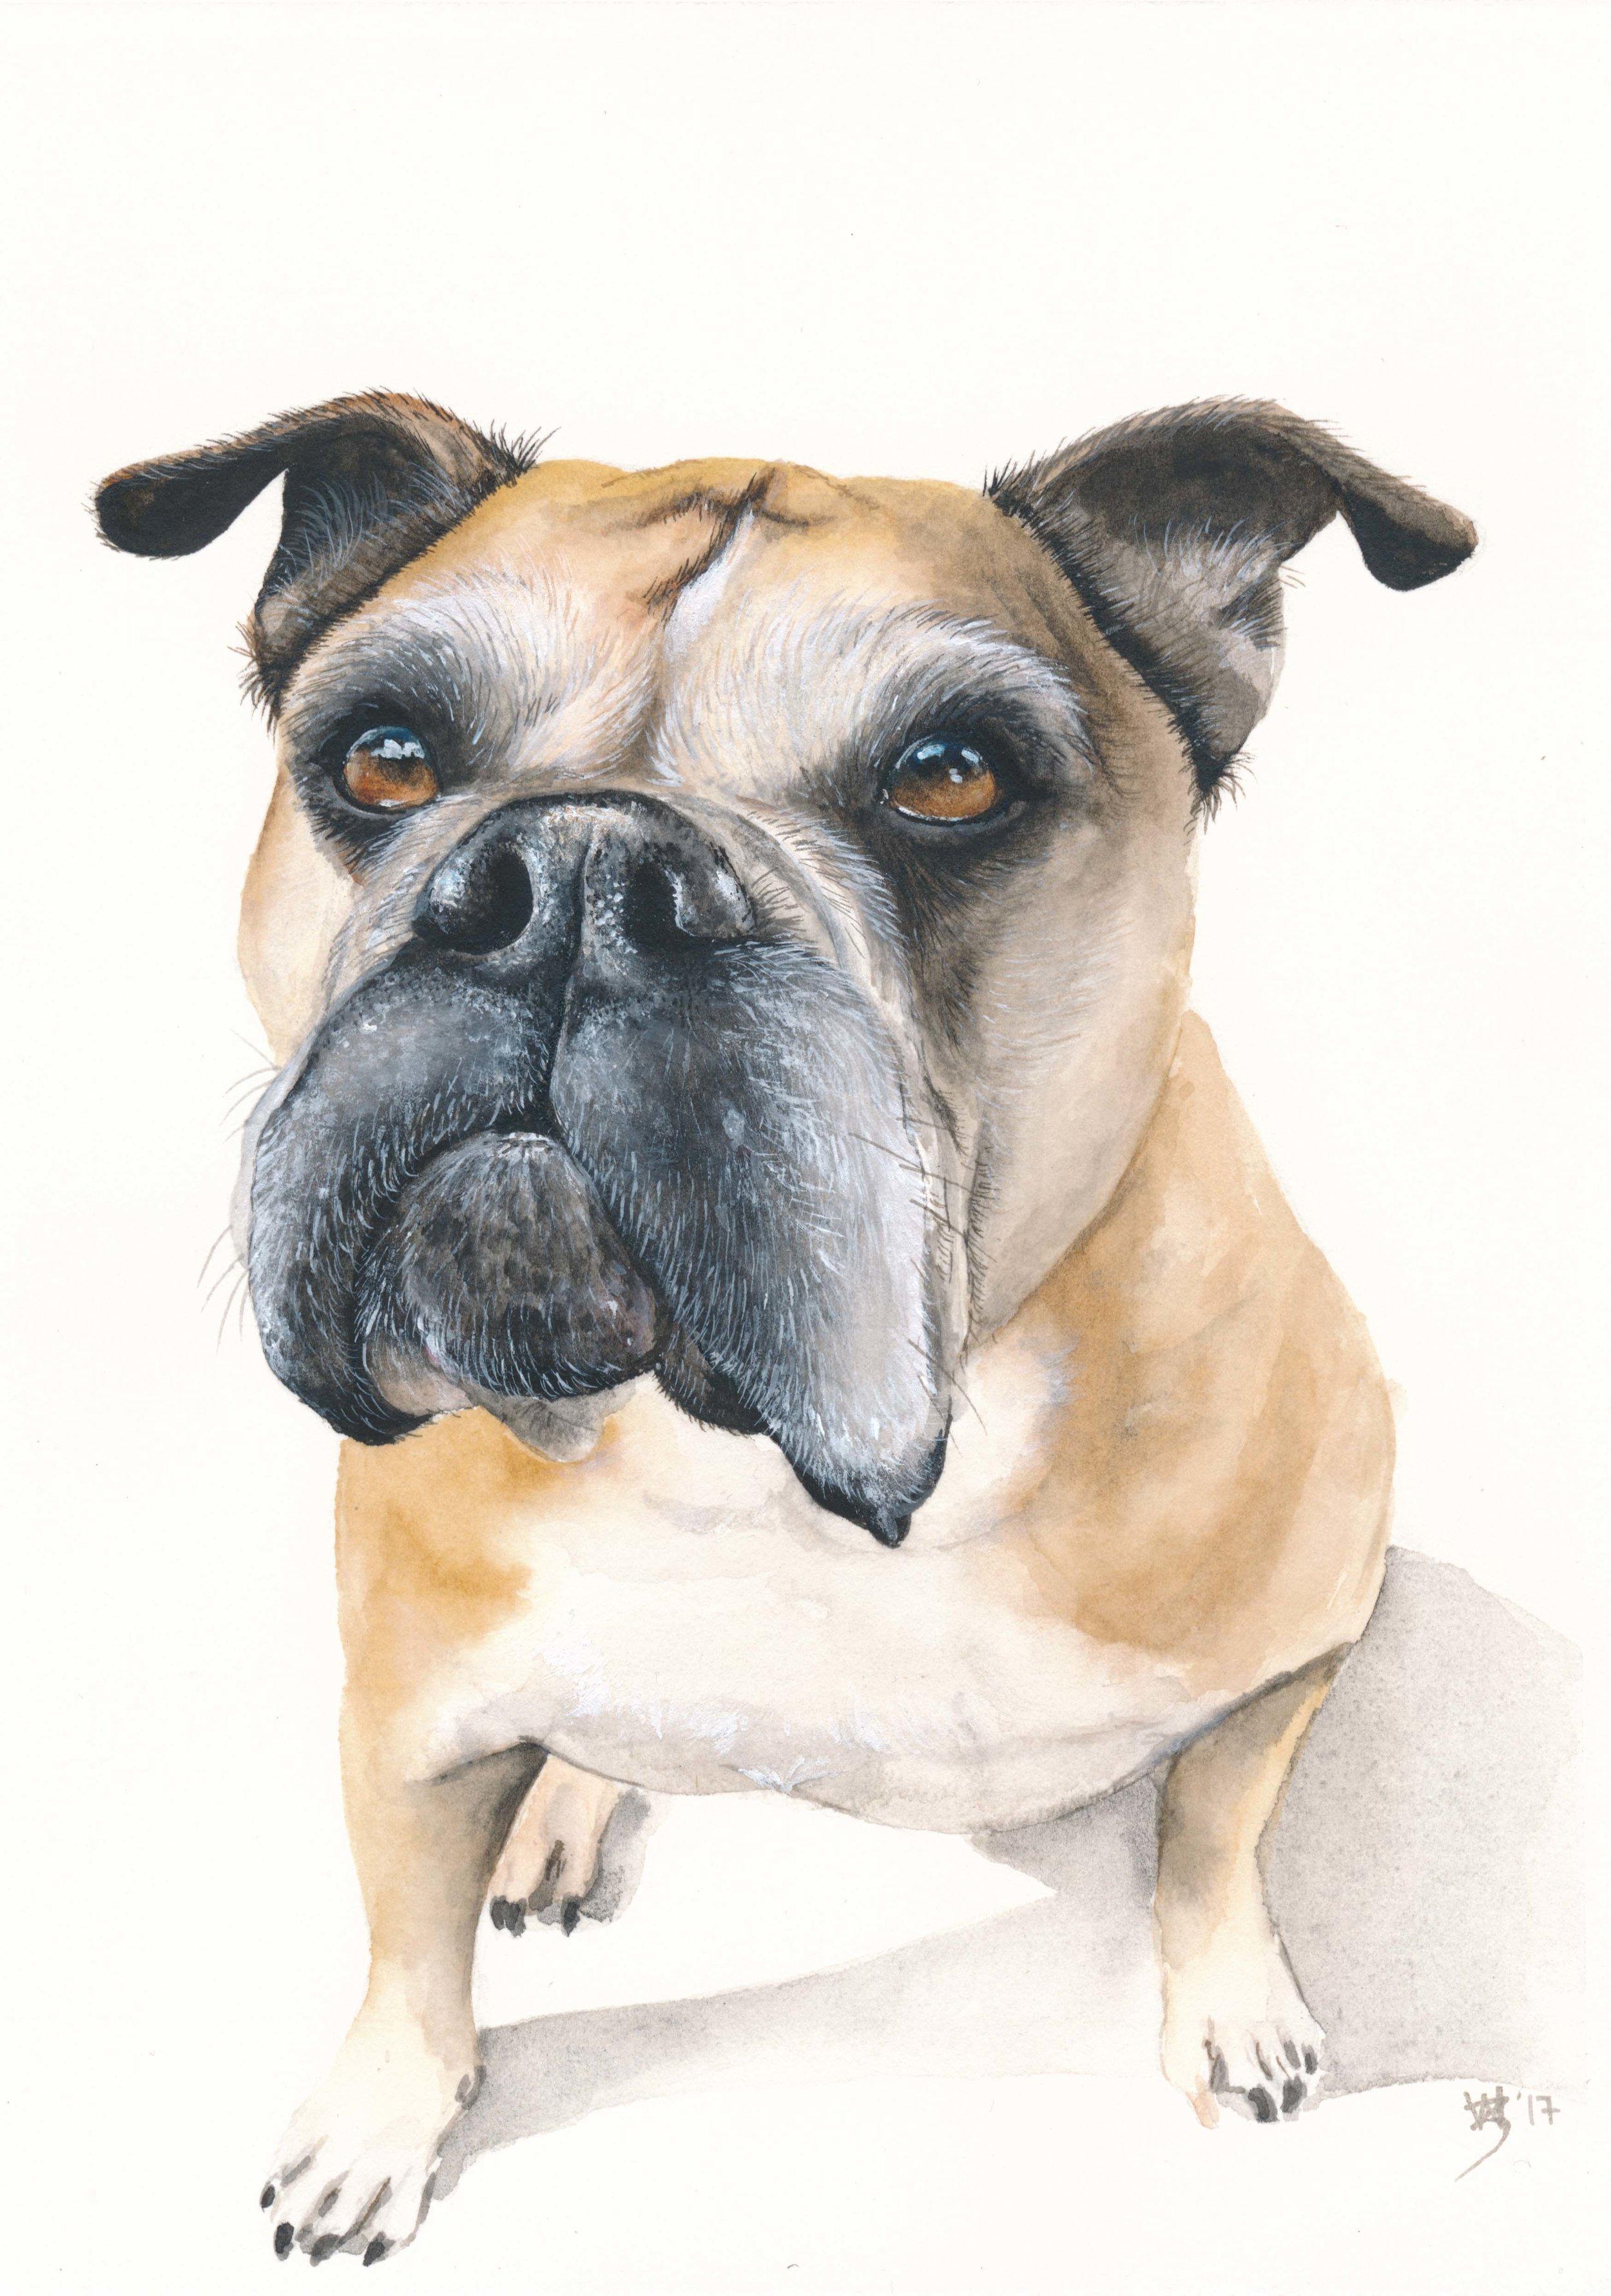 Brutus A5 Portrait watercolour - Zoe Wood 2017.jpg